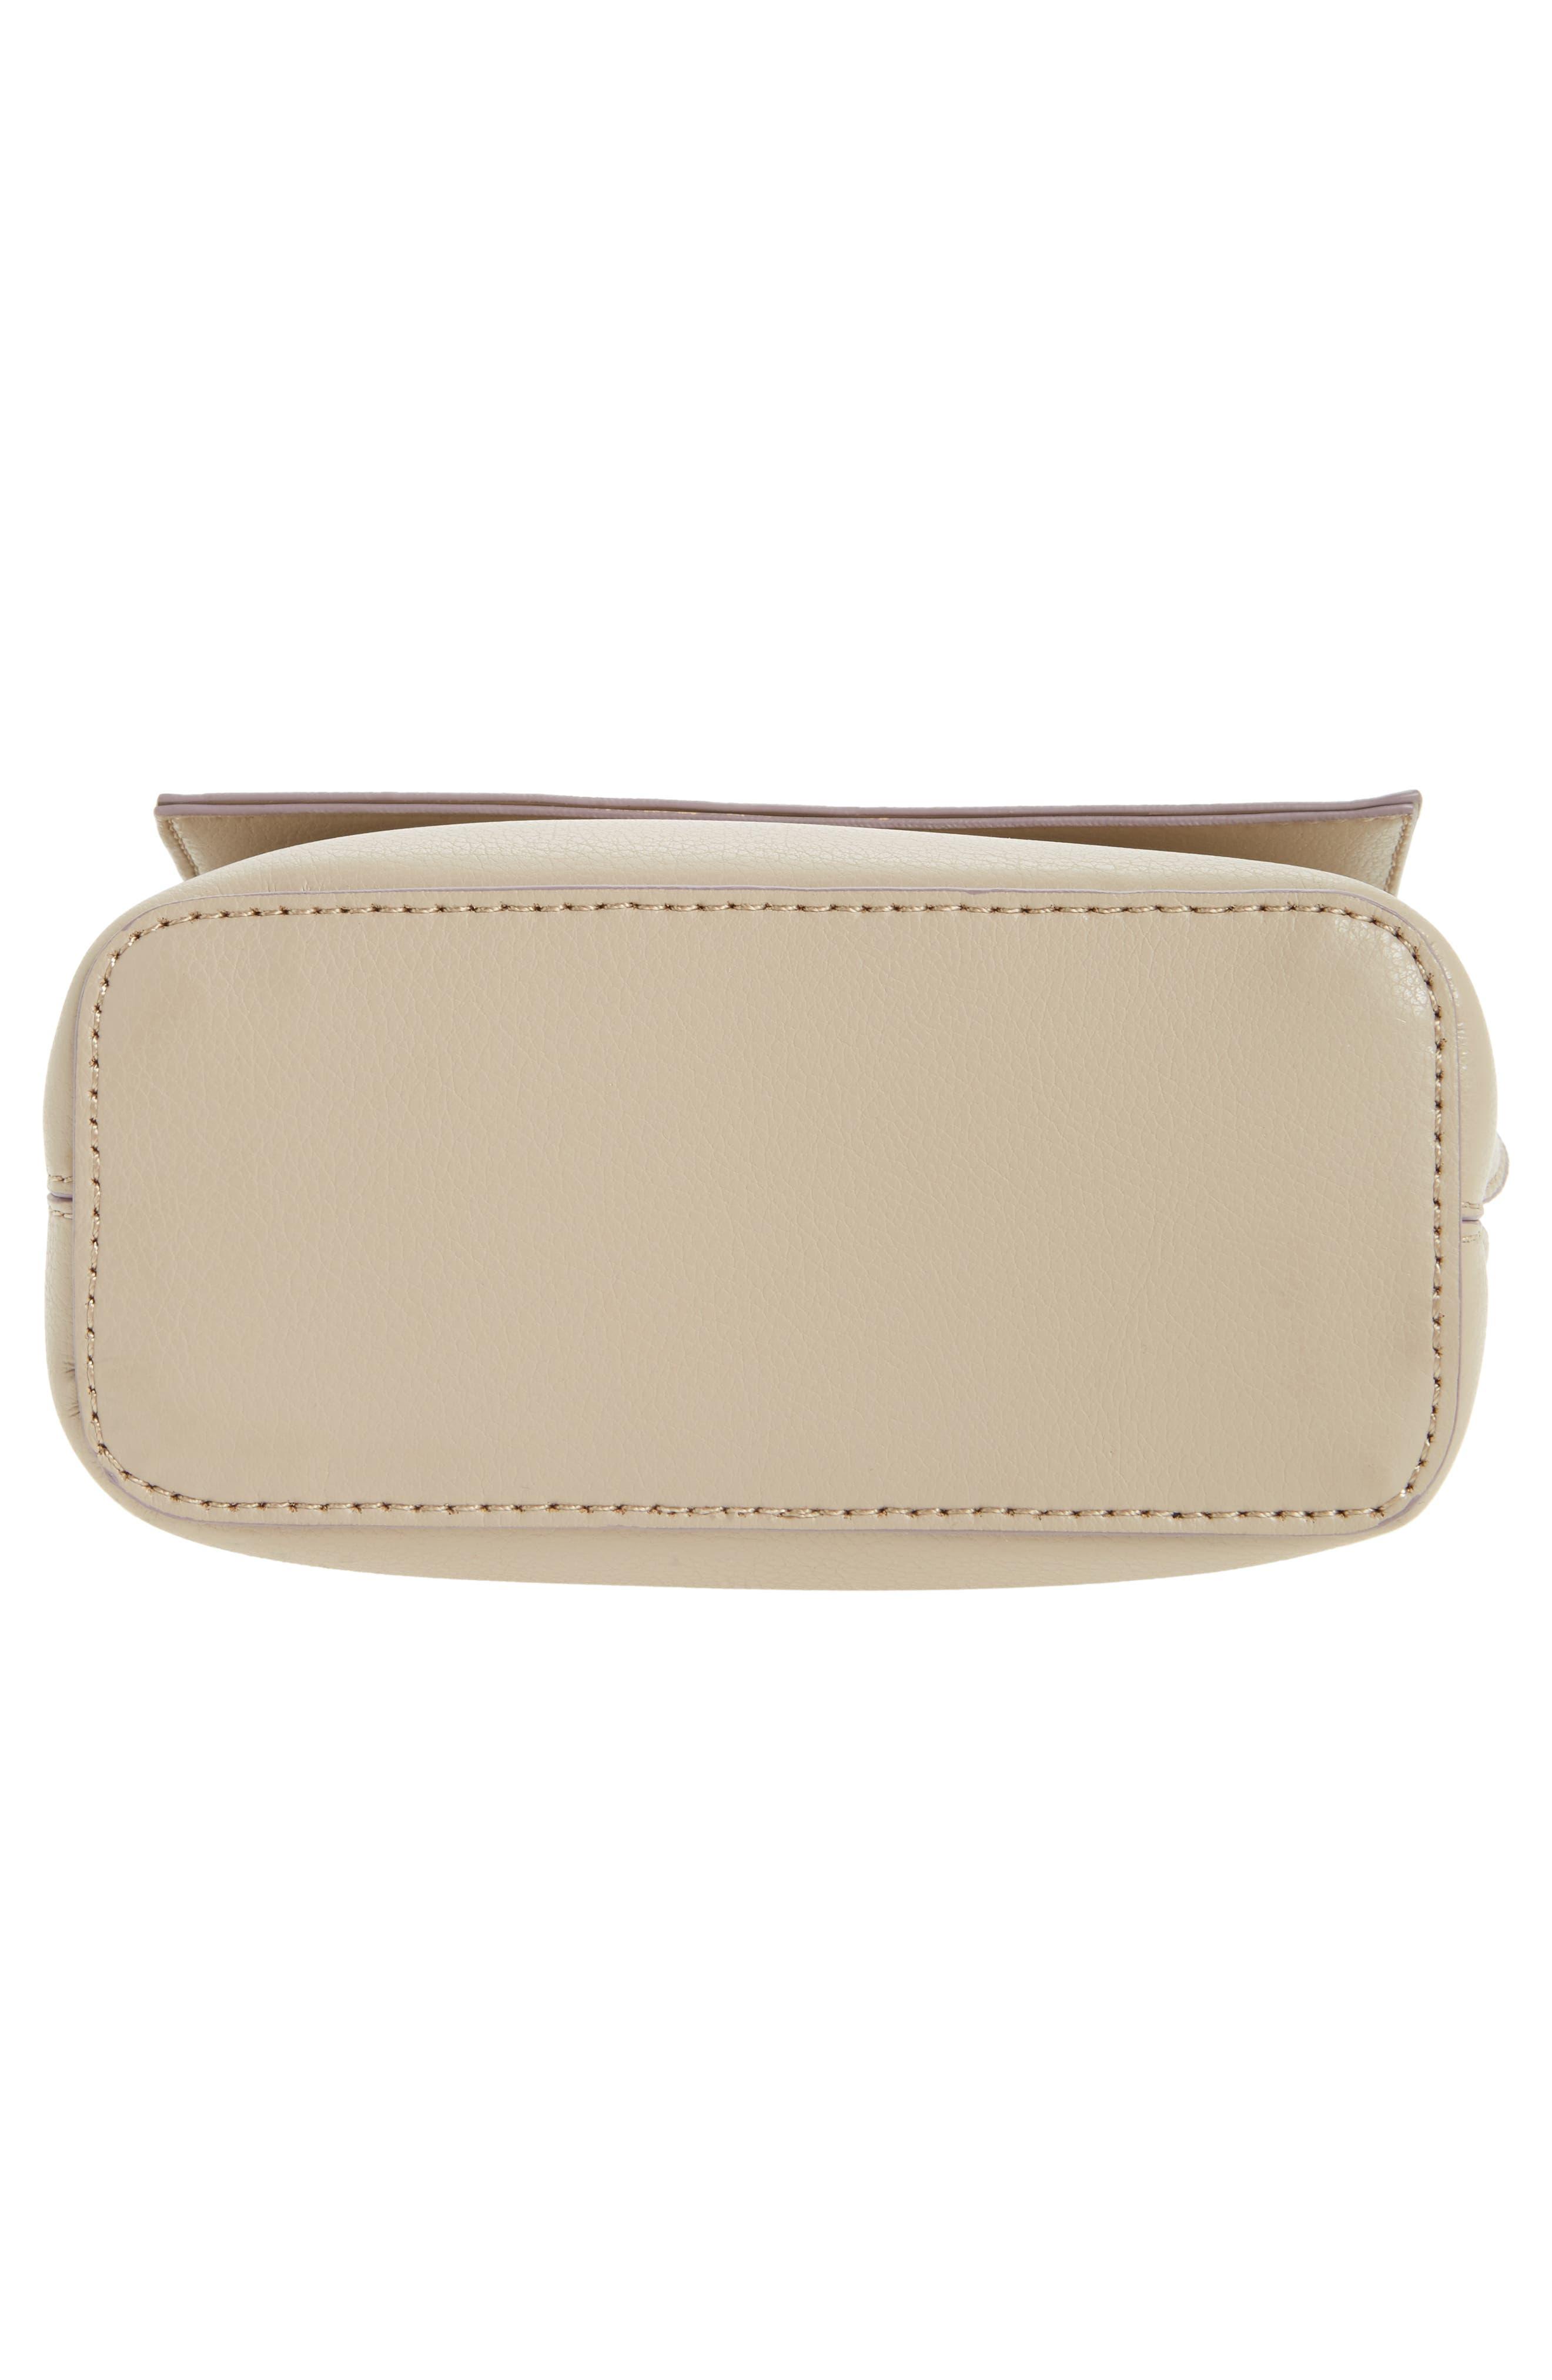 Mini Chino Crossbody Bag,                             Alternate thumbnail 6, color,                             020